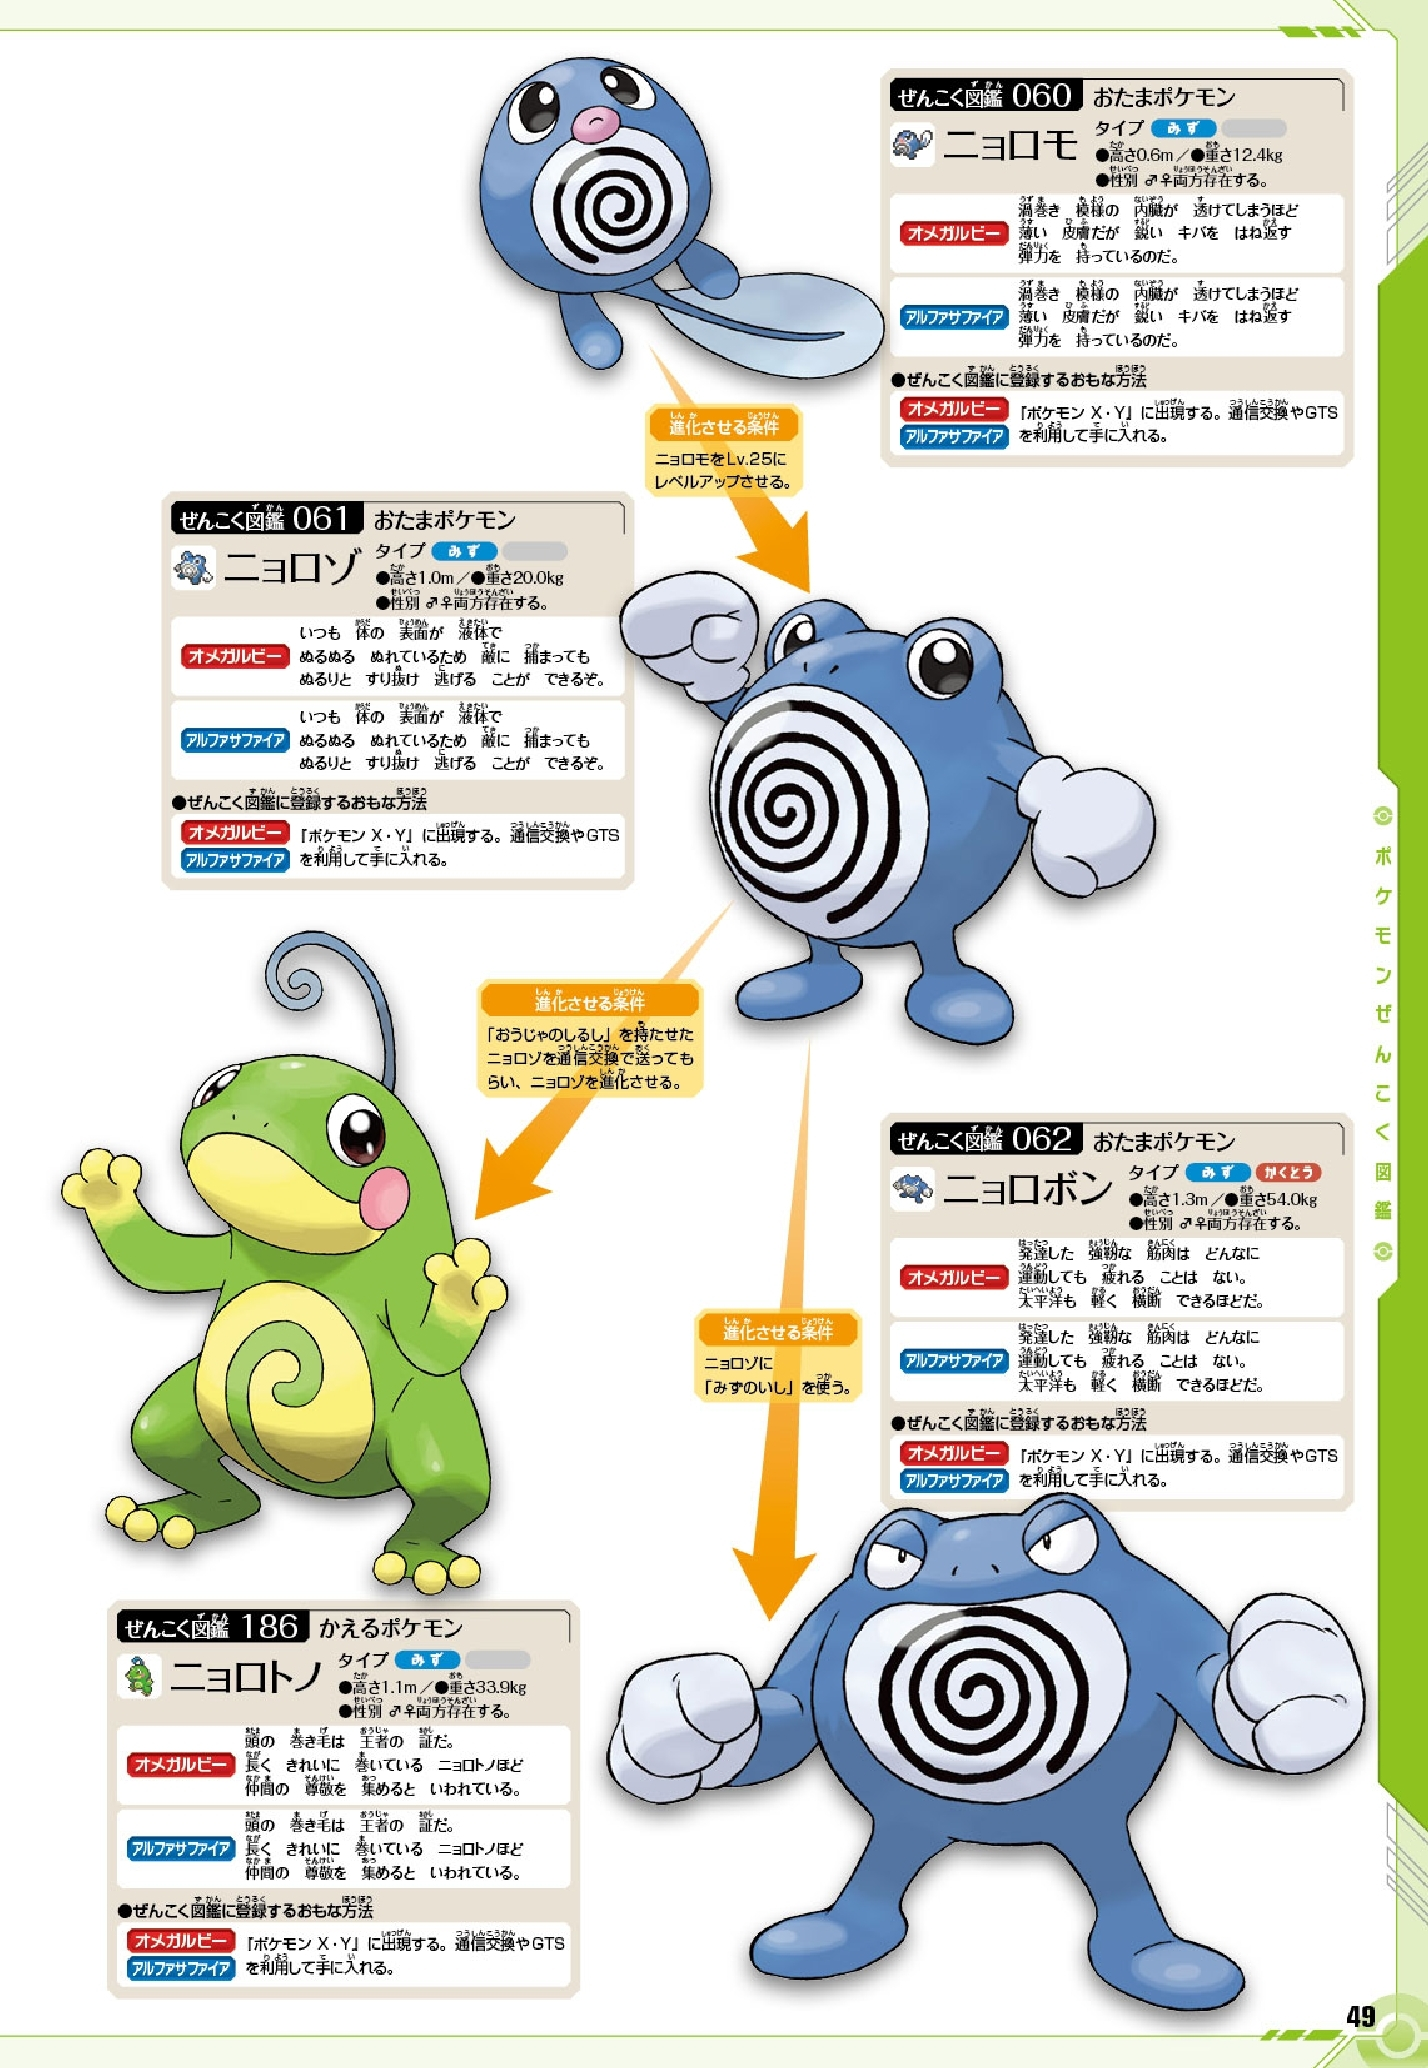 1997年4月1日『精灵宝可梦』游戏改编动画《ポケモン》《口袋妖怪图